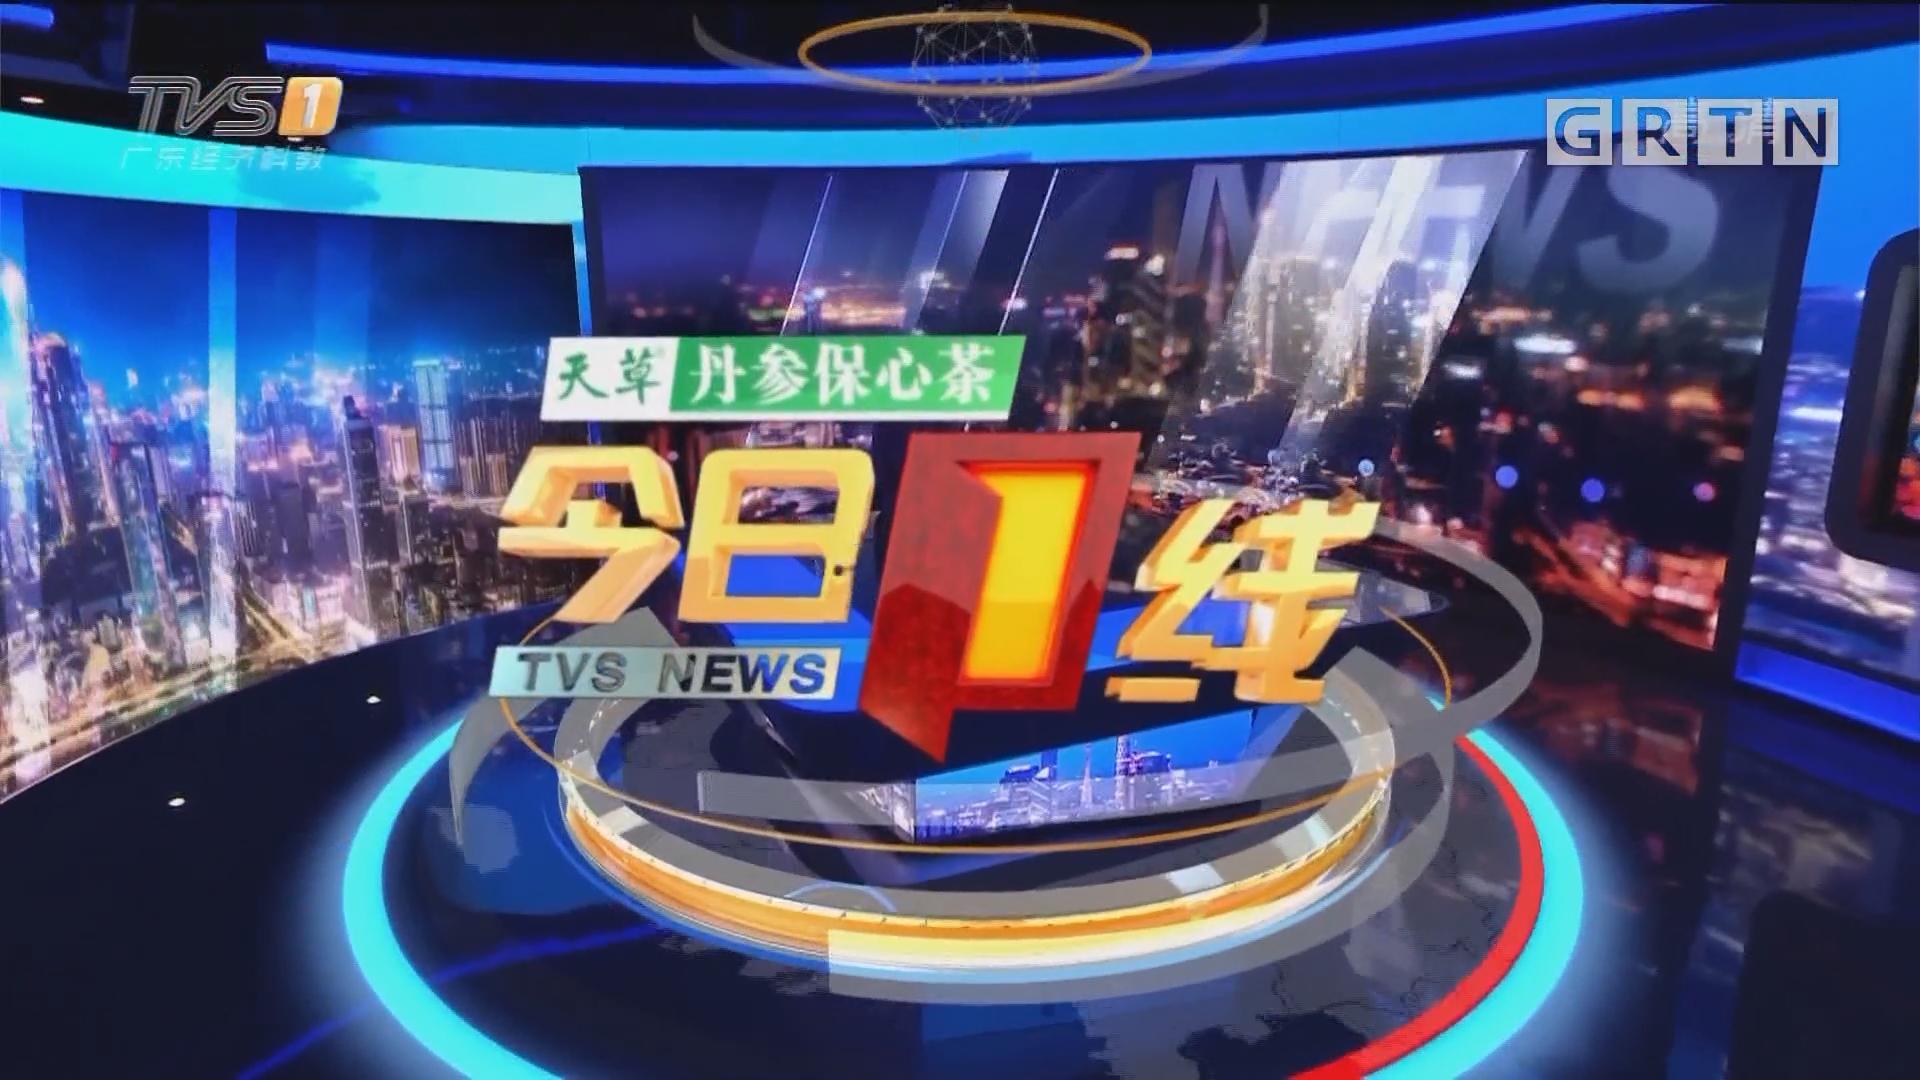 [HD][2019-05-05]今日一线:梅州五华:小车意外坠江三人失踪 村民自发下水搜救